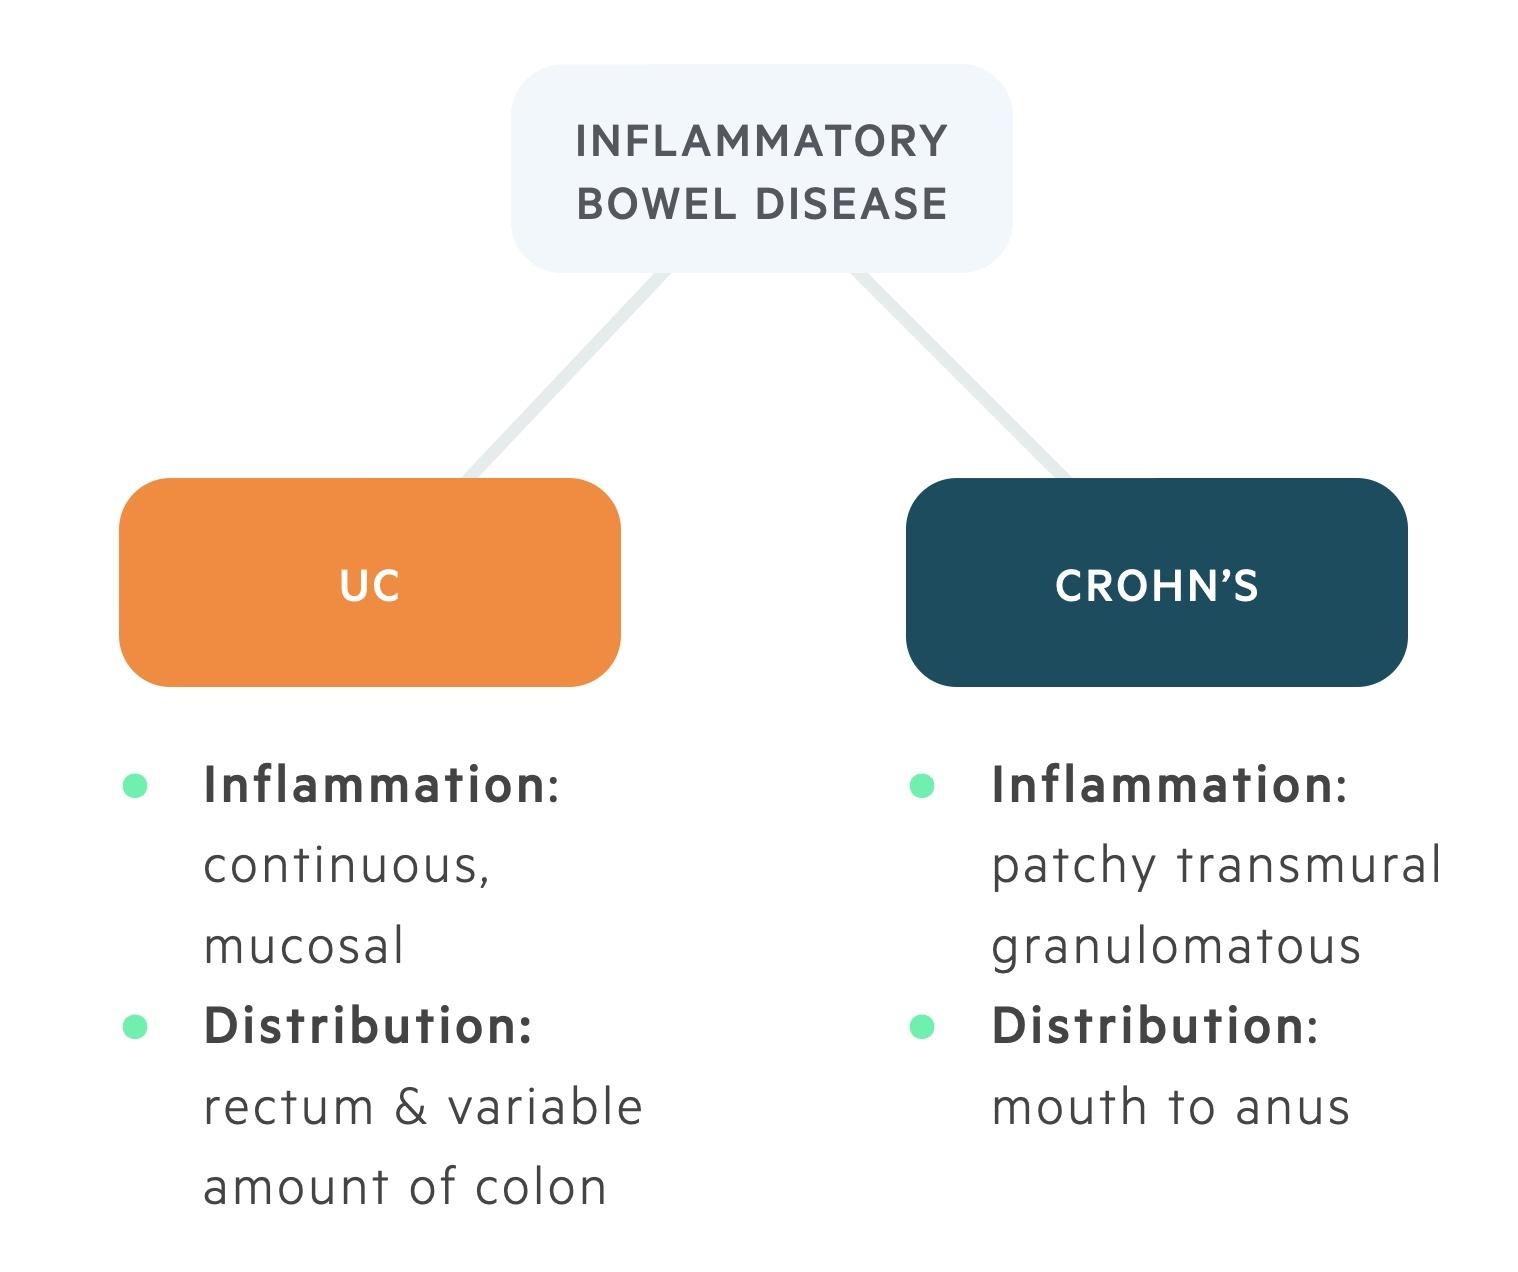 Types of inflammatory bowel disease